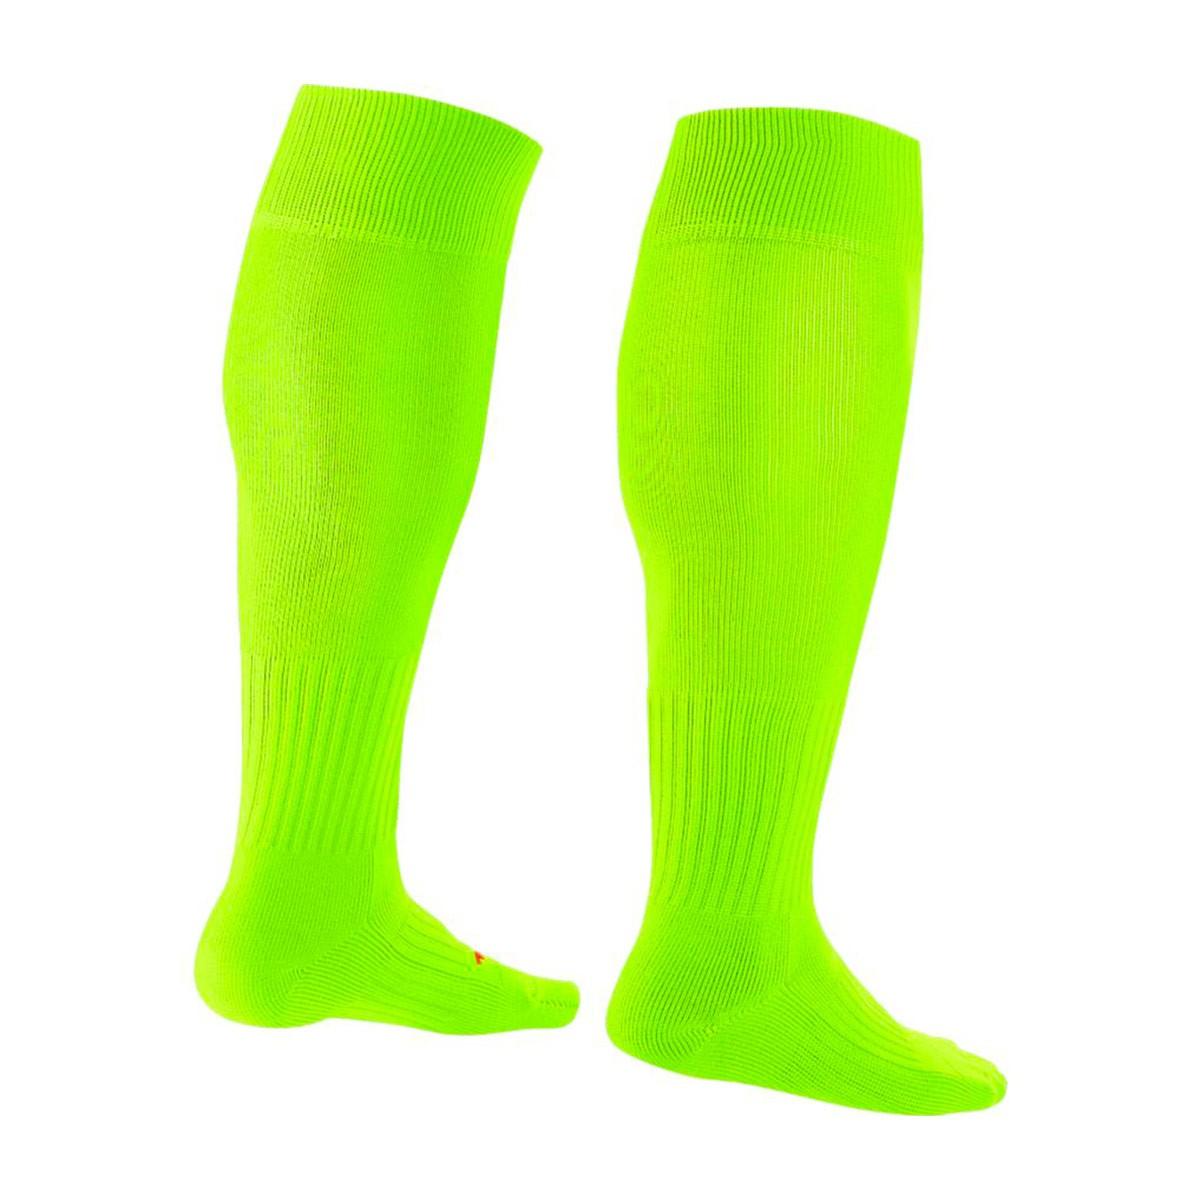 9b7527f7e Football Socks Nike Classic II Over-the-Calf Volt-Black - Tienda de fútbol  Fútbol Emotion